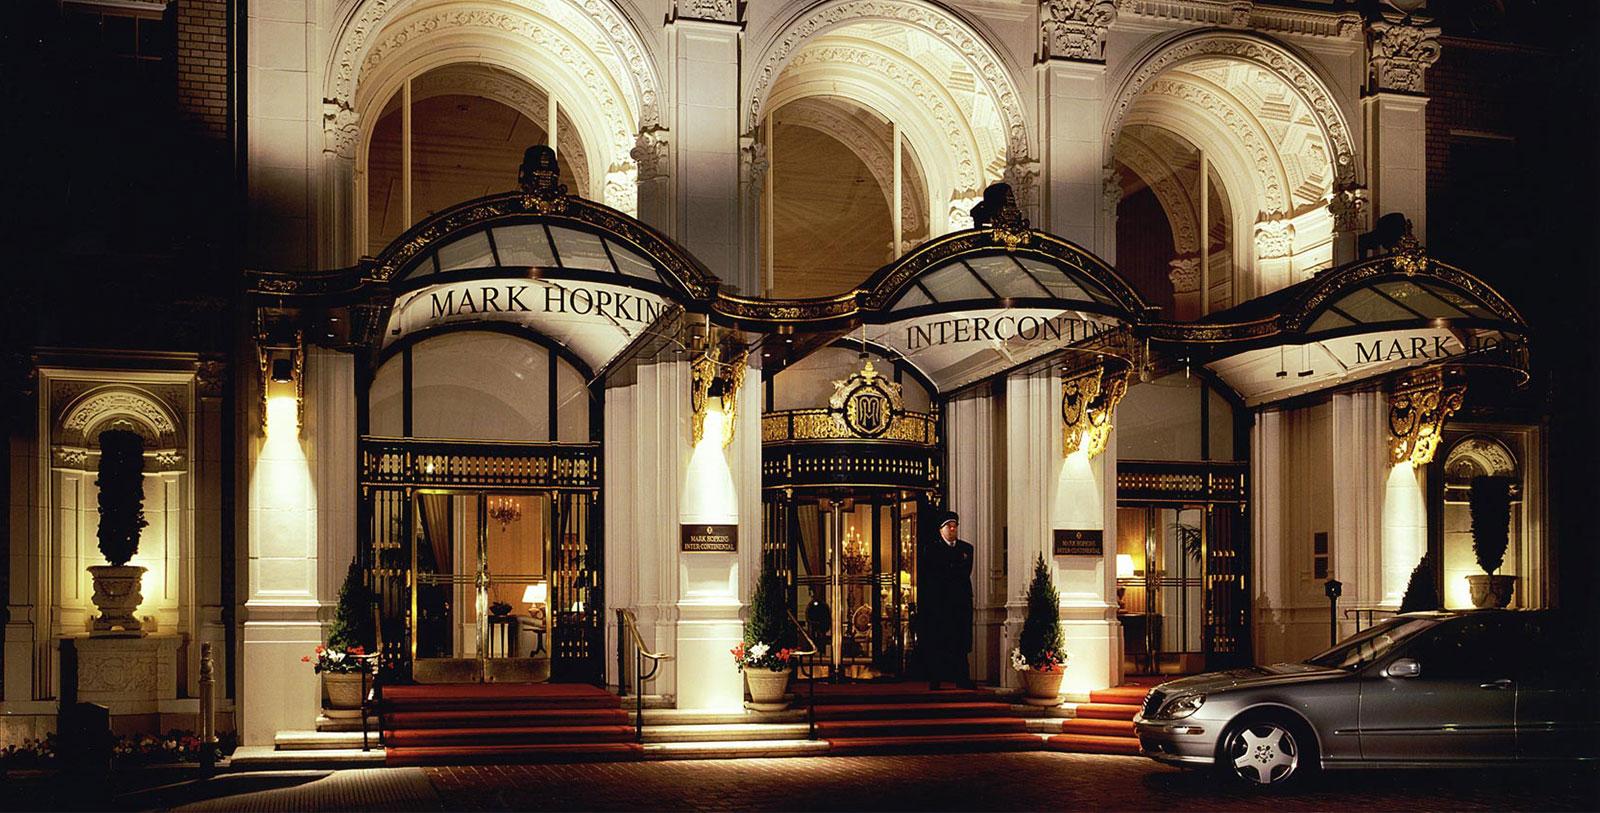 Image of Hotel Exterior at Night, InterContinental Mark Hopkins Hotel in San Francisco, California, 1926, Member of Historic Hotels of America, Hot Deals